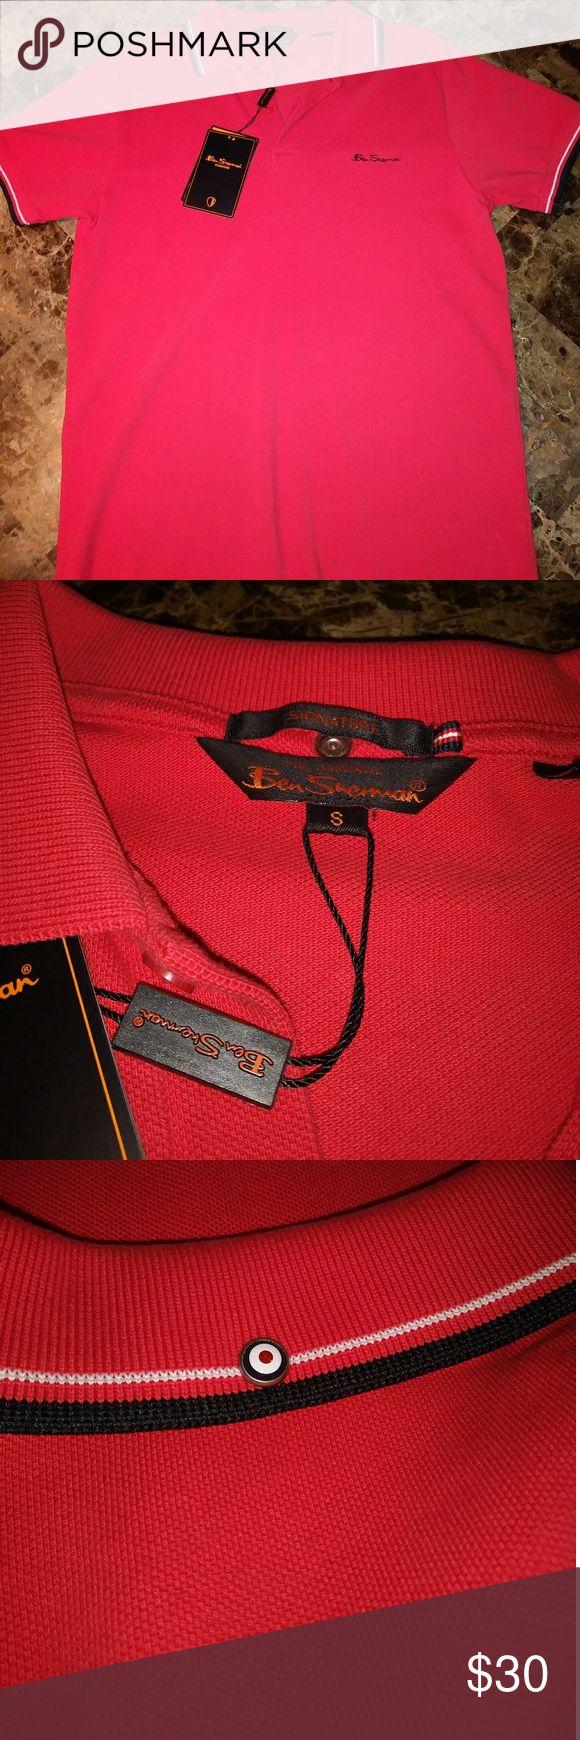 NWT Ben Sherman polo collared shirt Red Ben Sherman polo with black and white piping Ben Sherman Shirts Polos